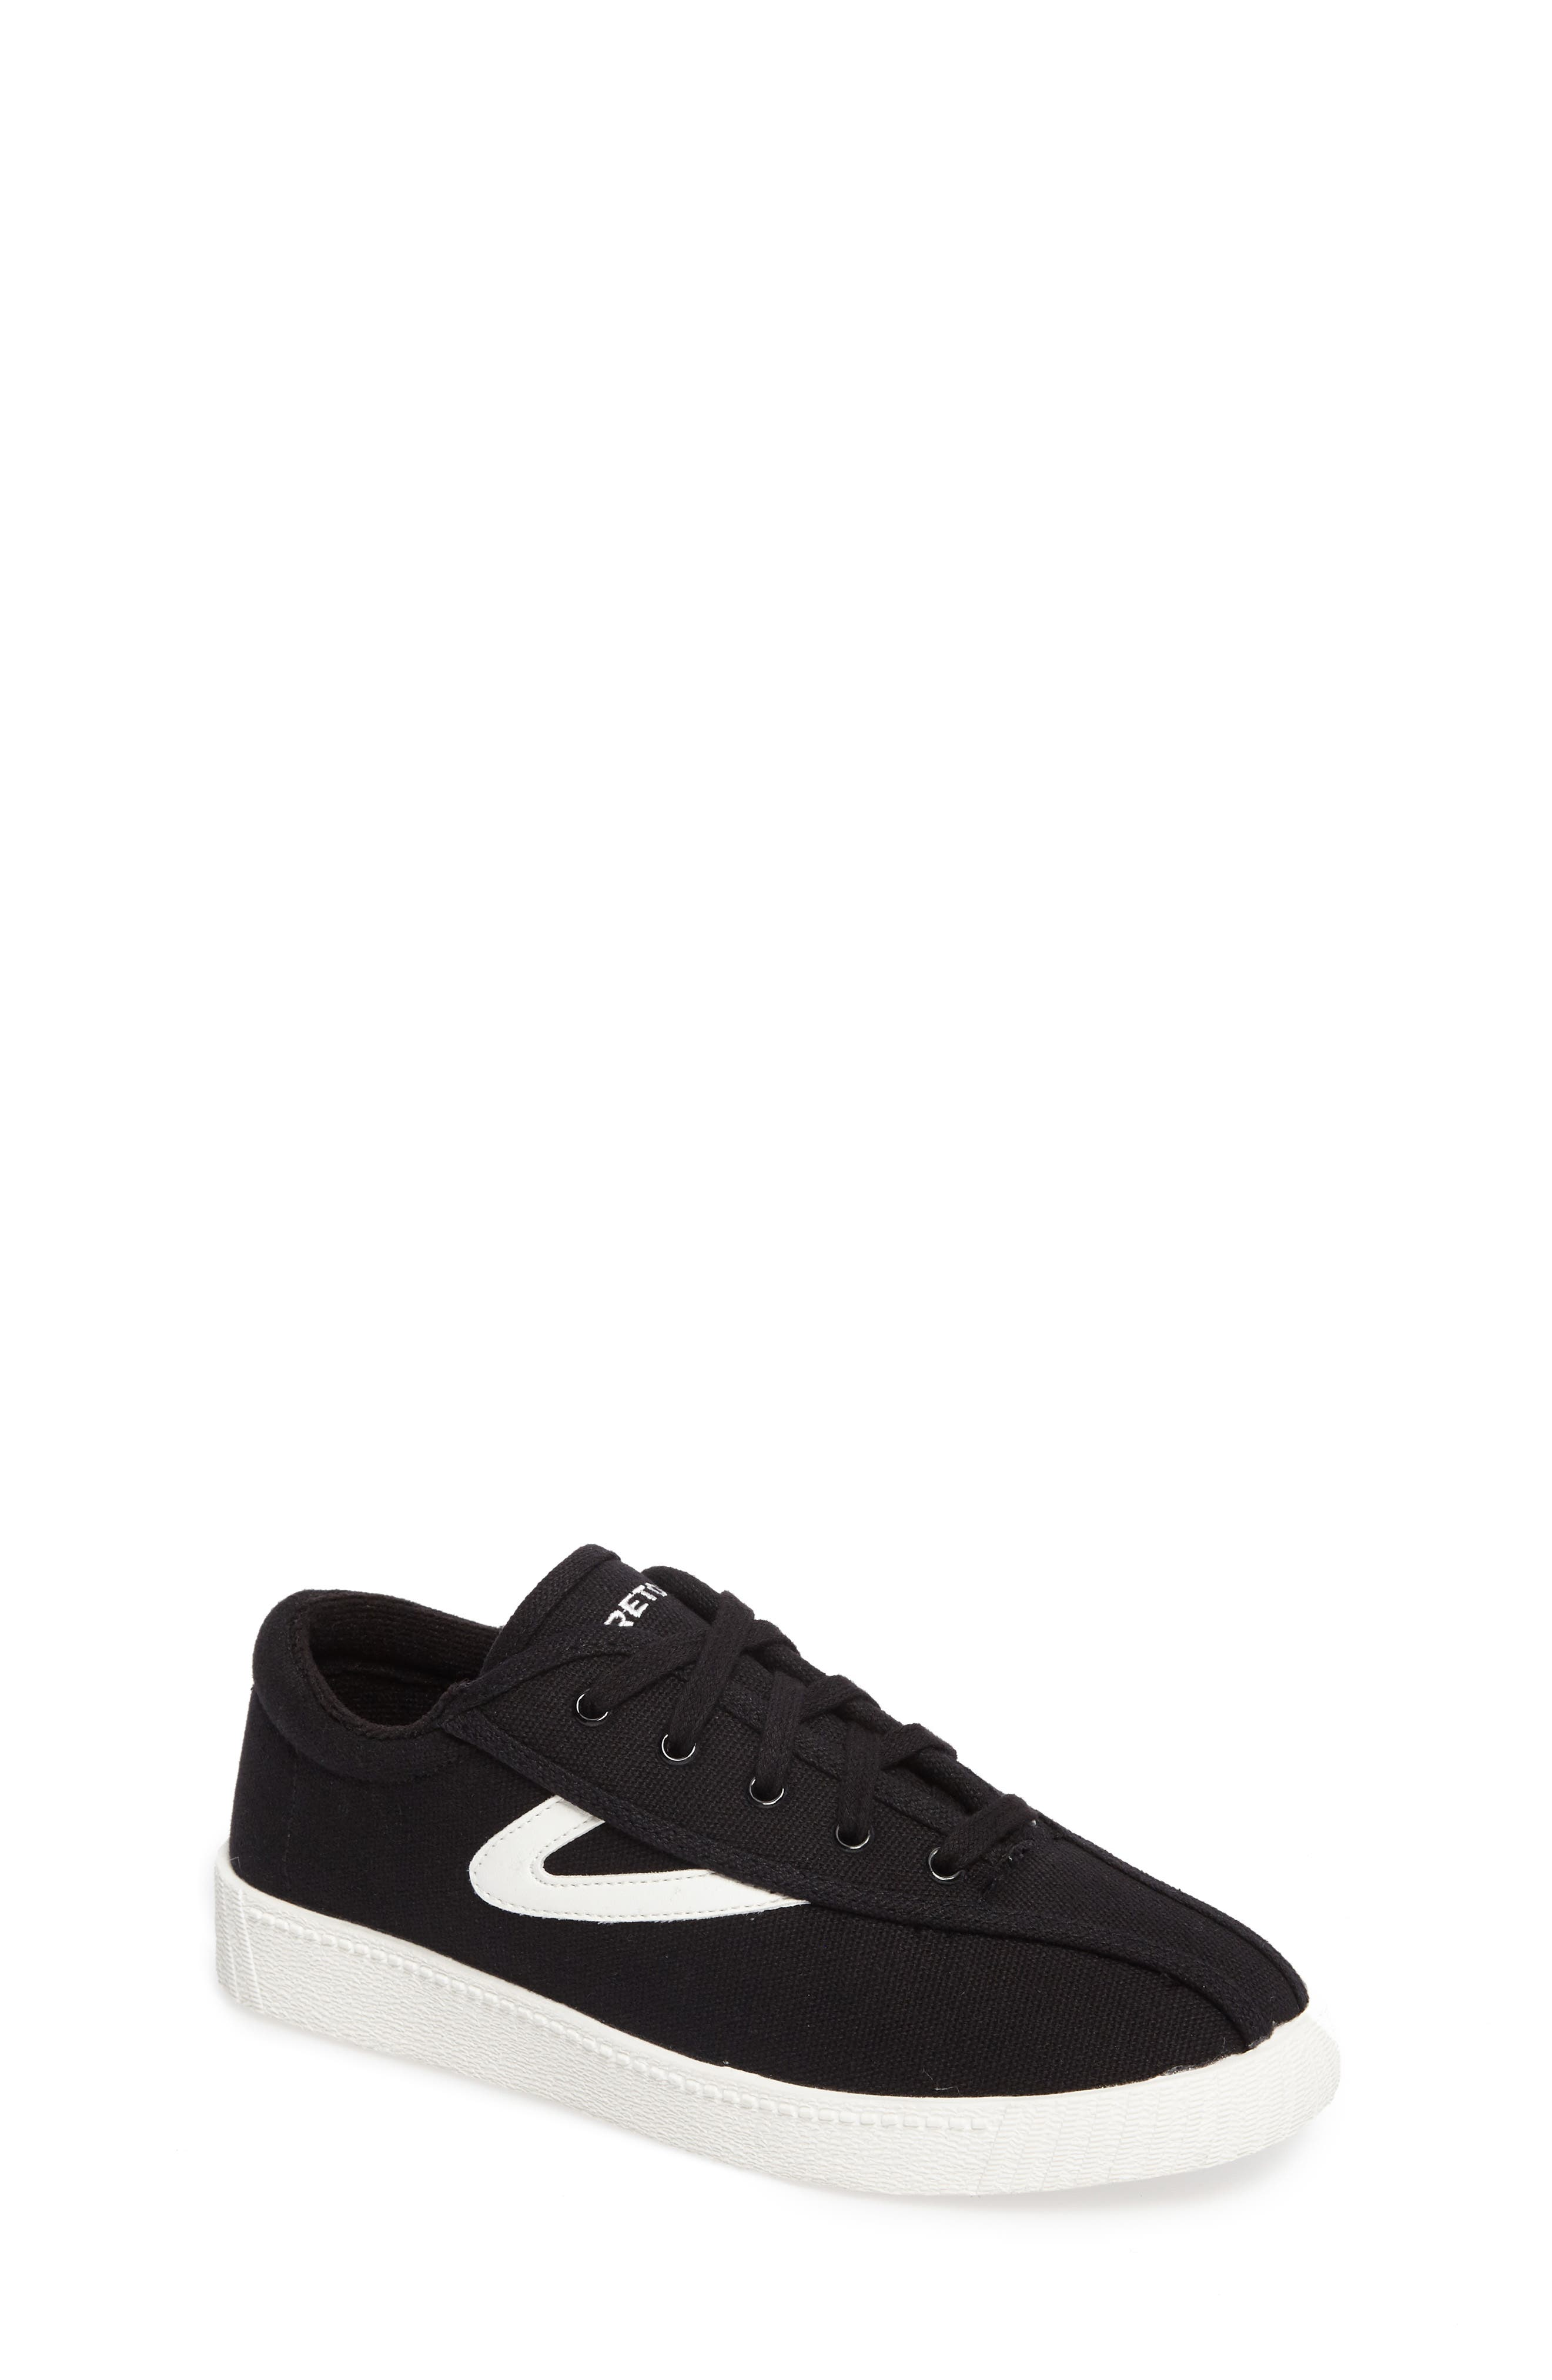 Nylite Plus Sneaker,                             Main thumbnail 1, color,